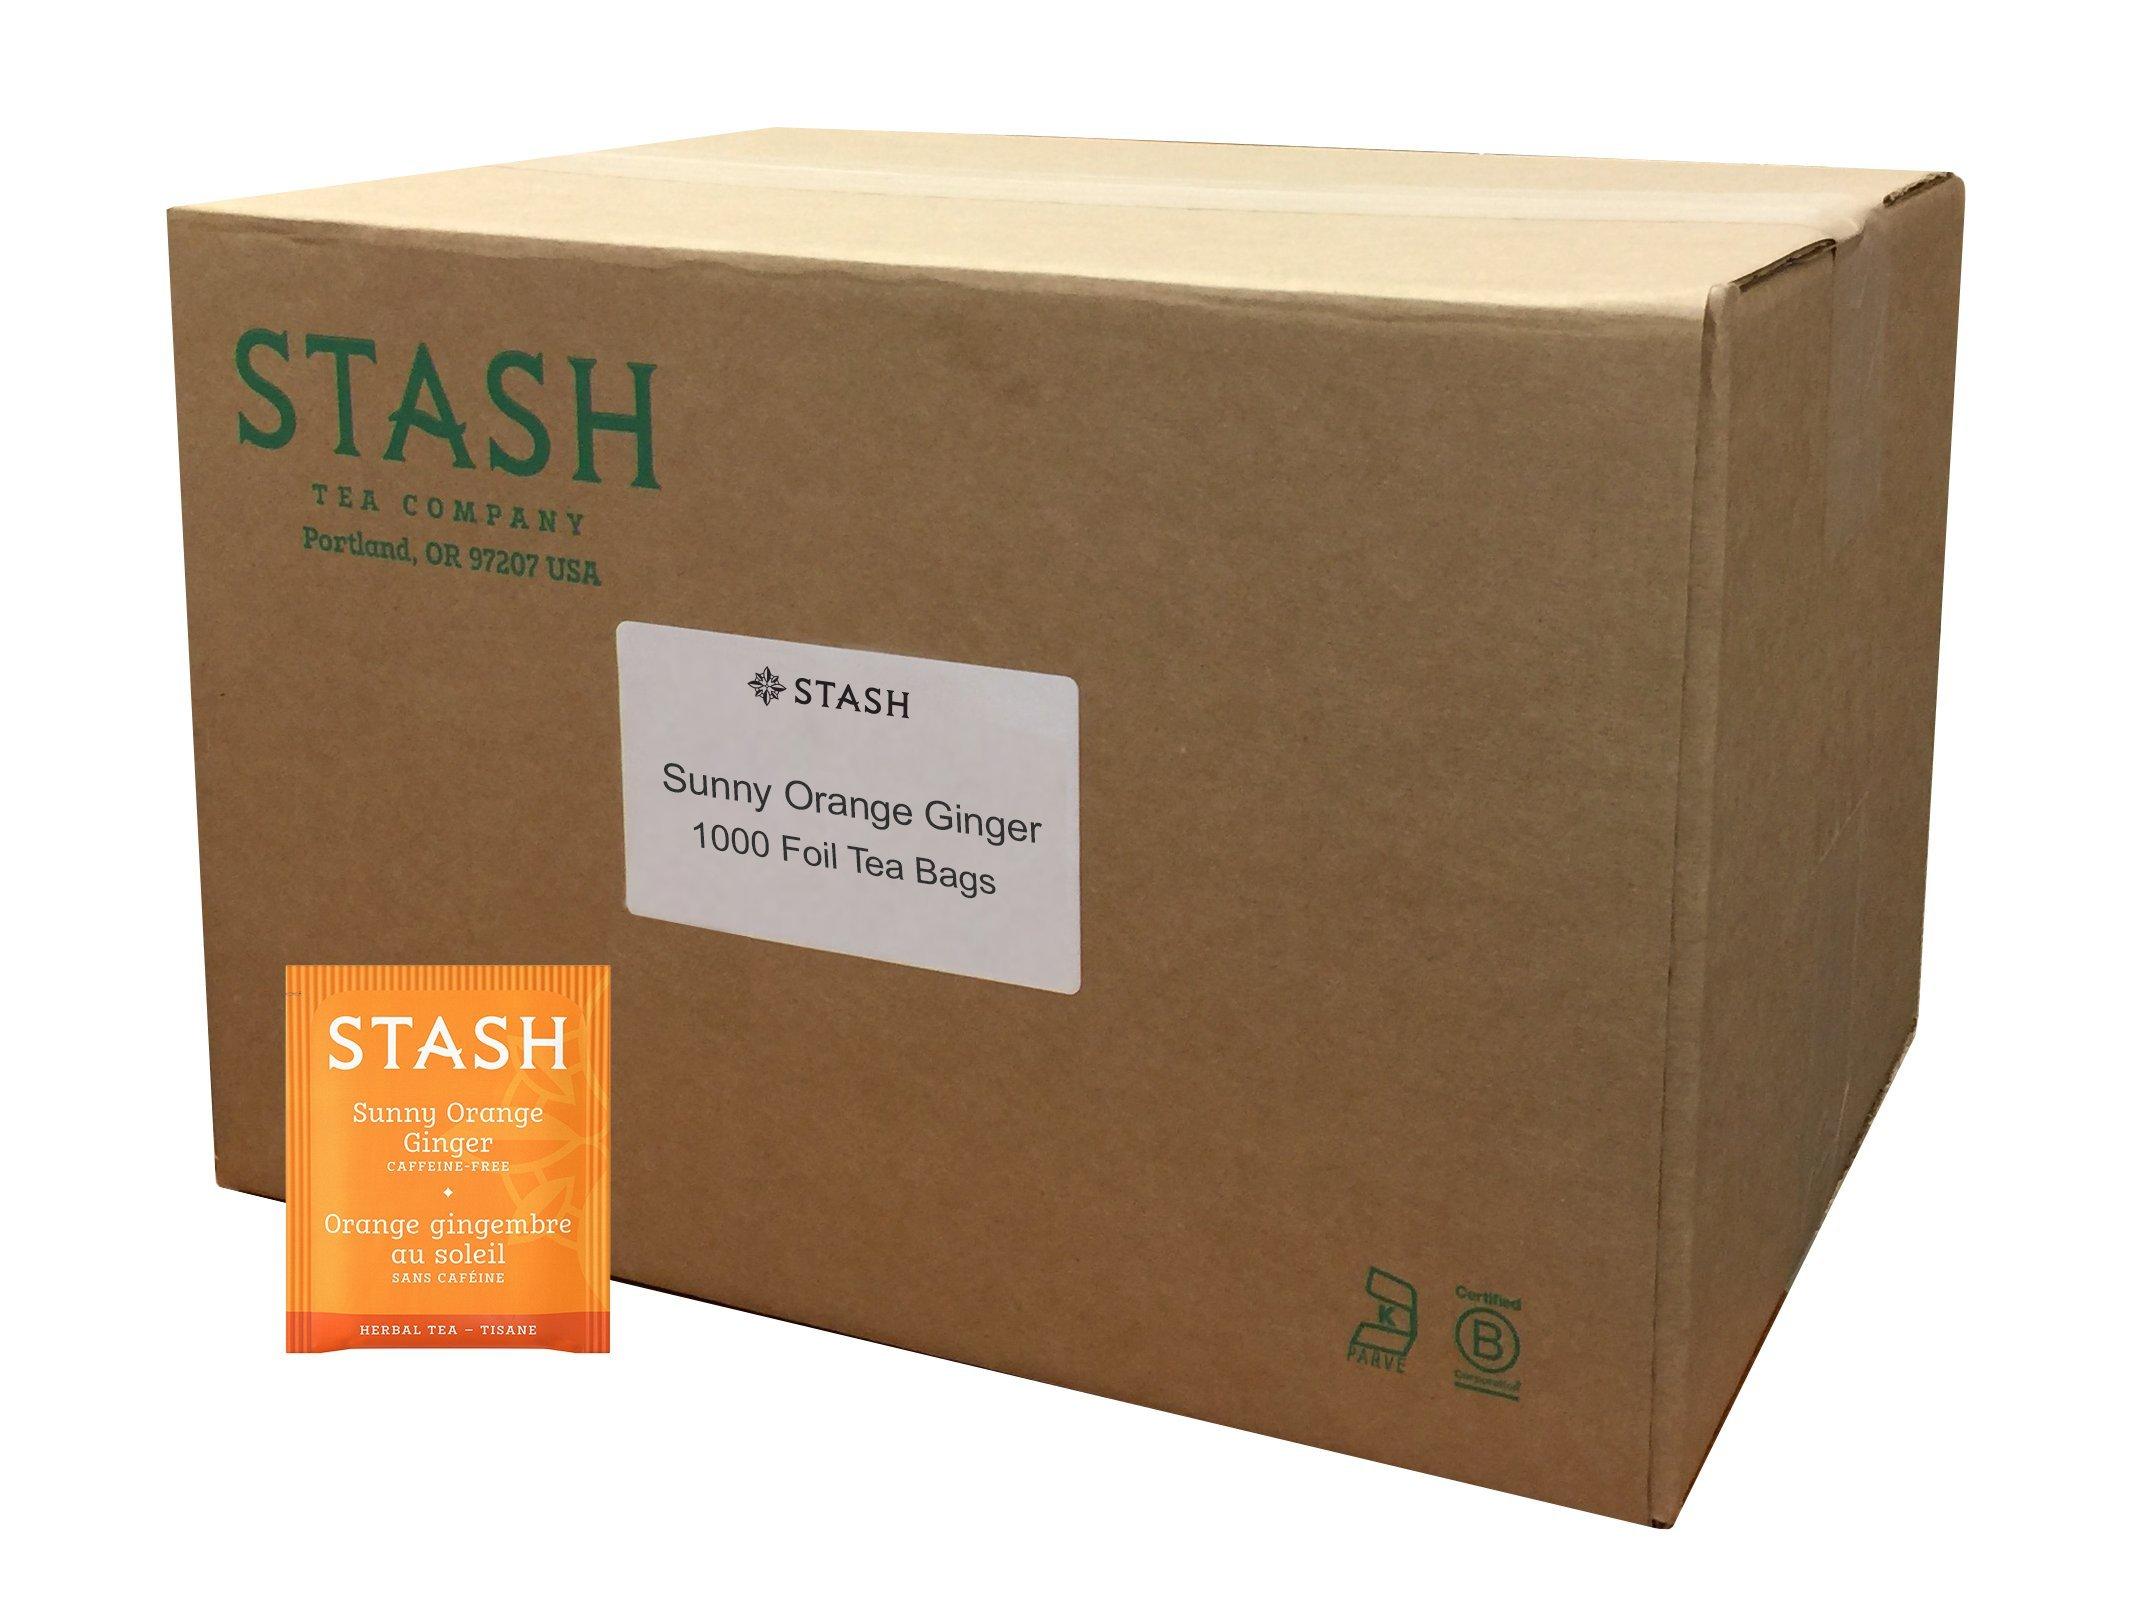 Stash Tea Sunny Orange Ginger Herbal Tea 1000 Count Individual Uncaffeinated Herbal Tea Bags for Use in Teapots Mugs or Cups, Brew Hot Tea or Iced Tea by Stash Tea (Image #1)